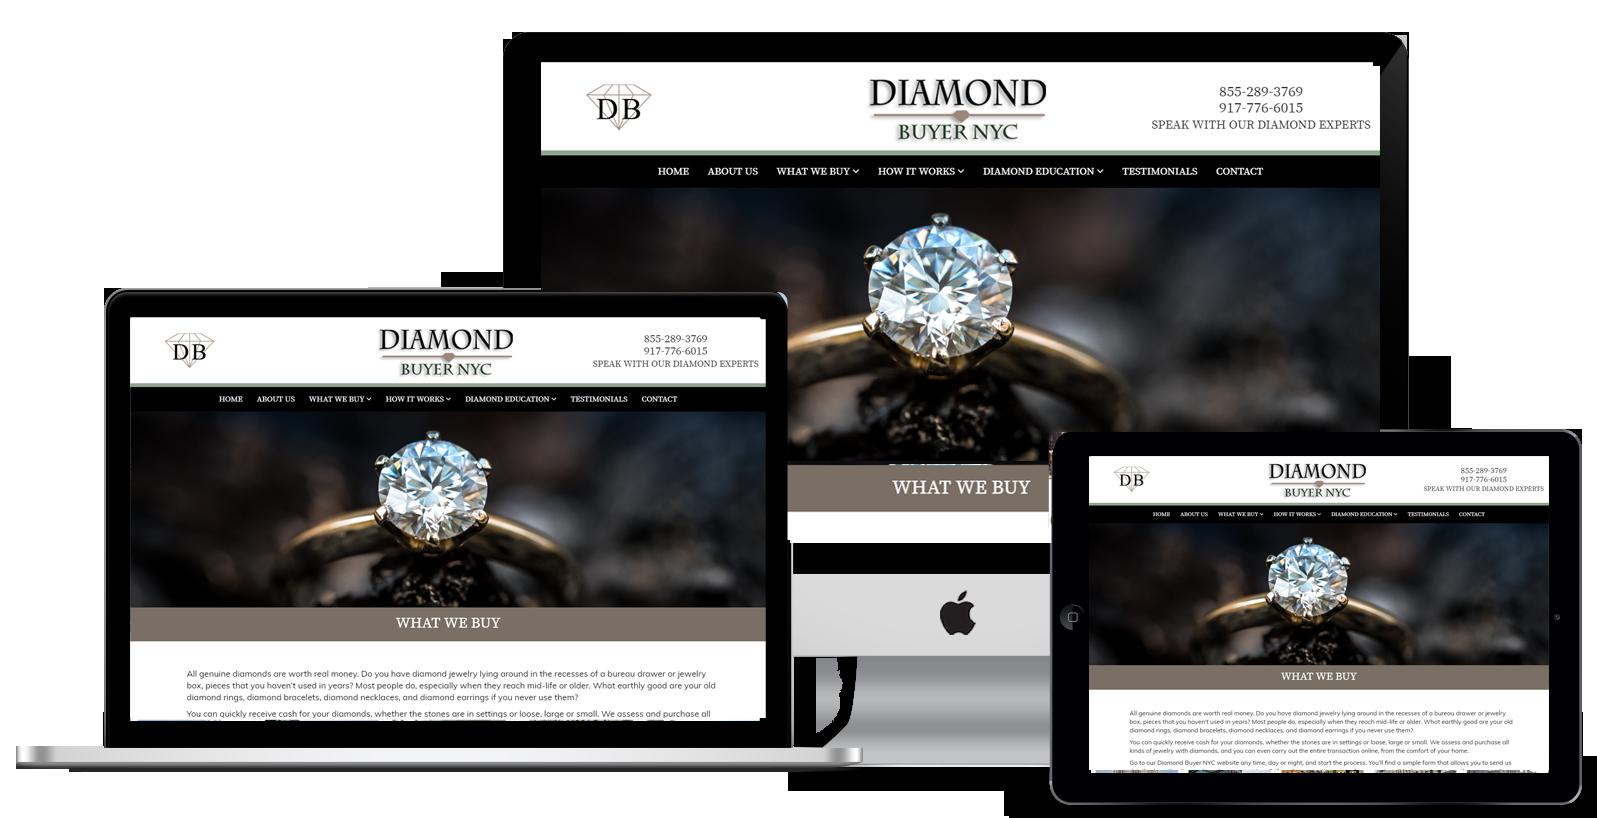 Website Design Agency Boston In 2020 Web Design Agency Website Design Web Design Company